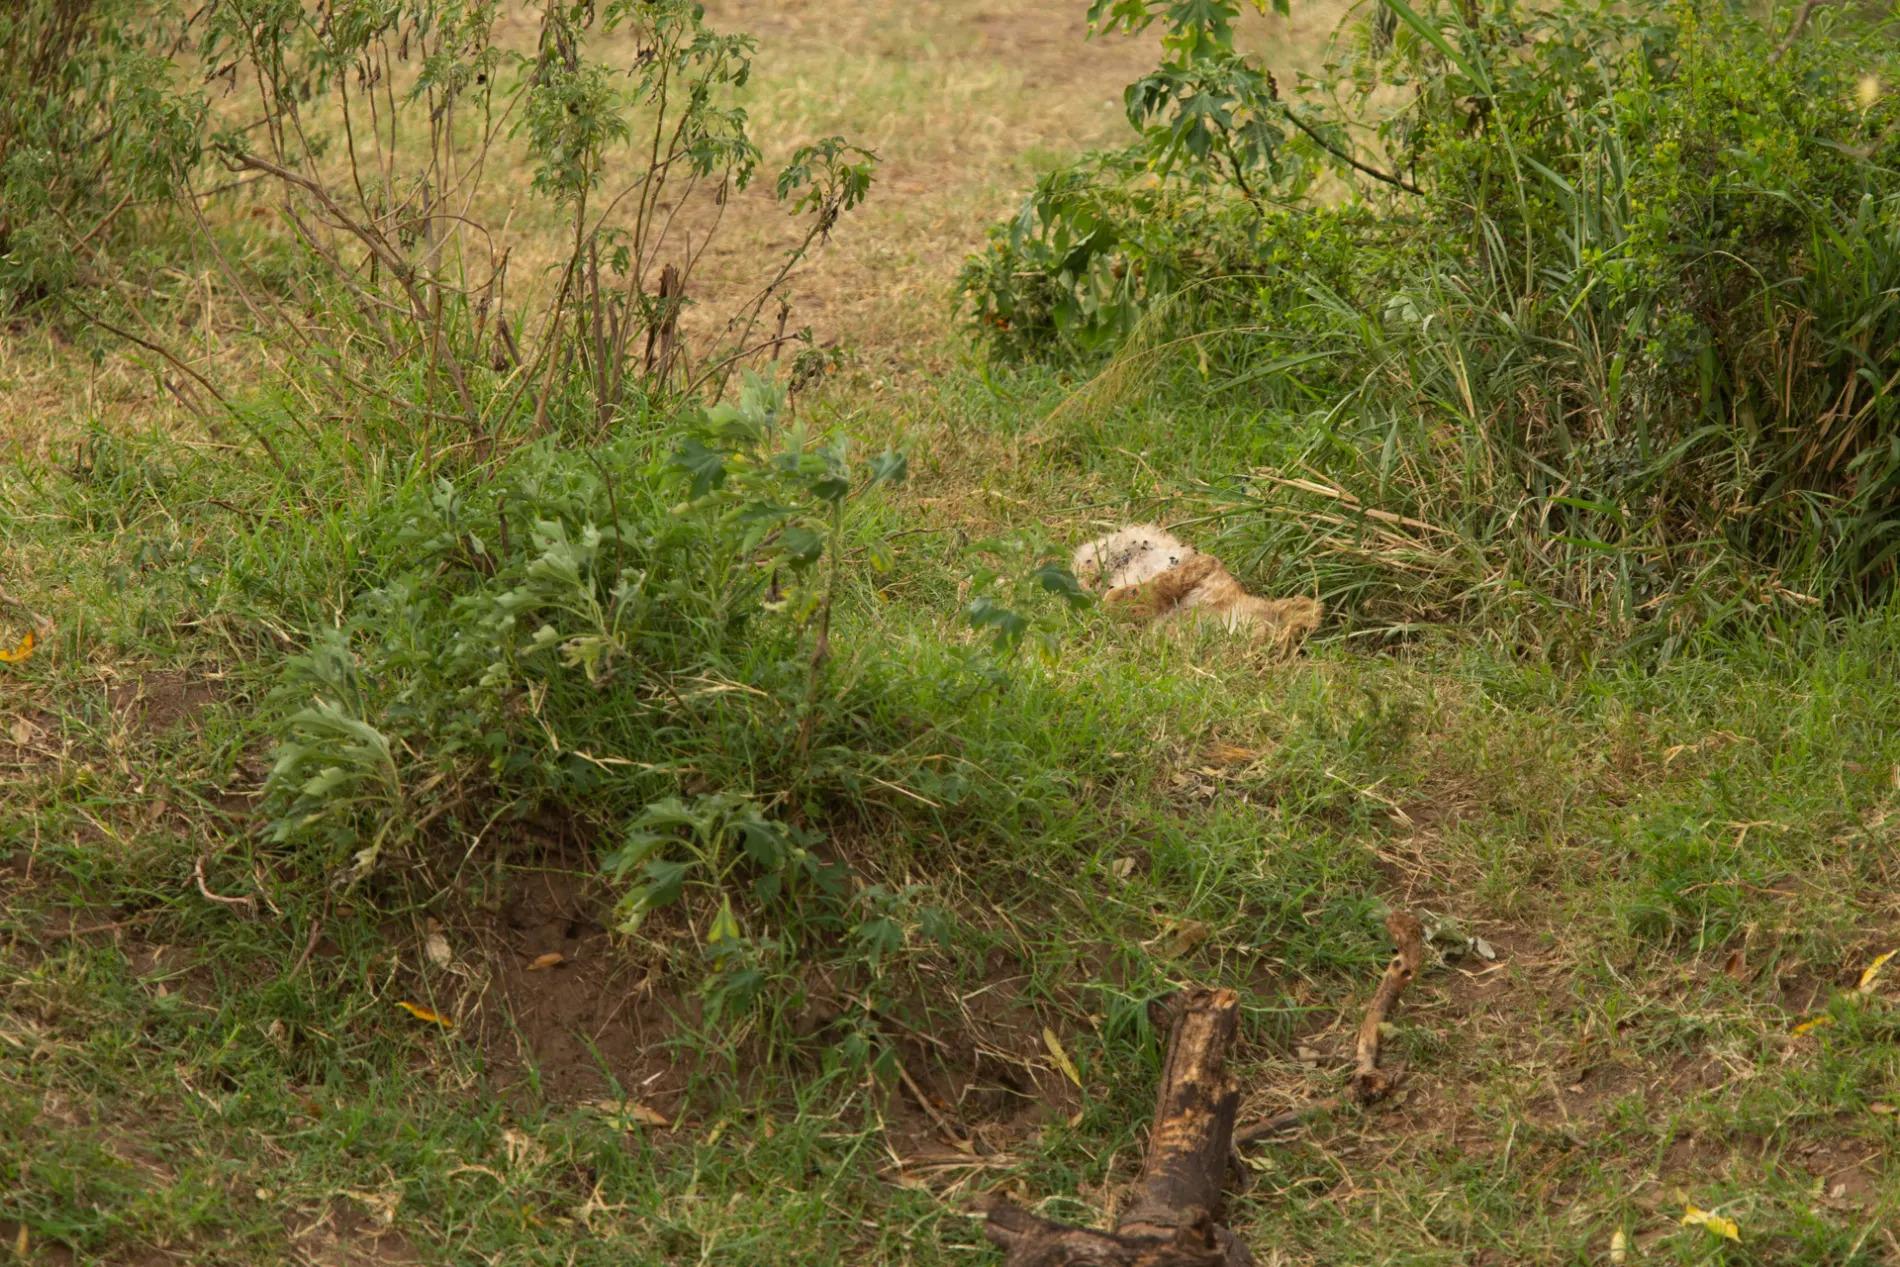 Lion cub death